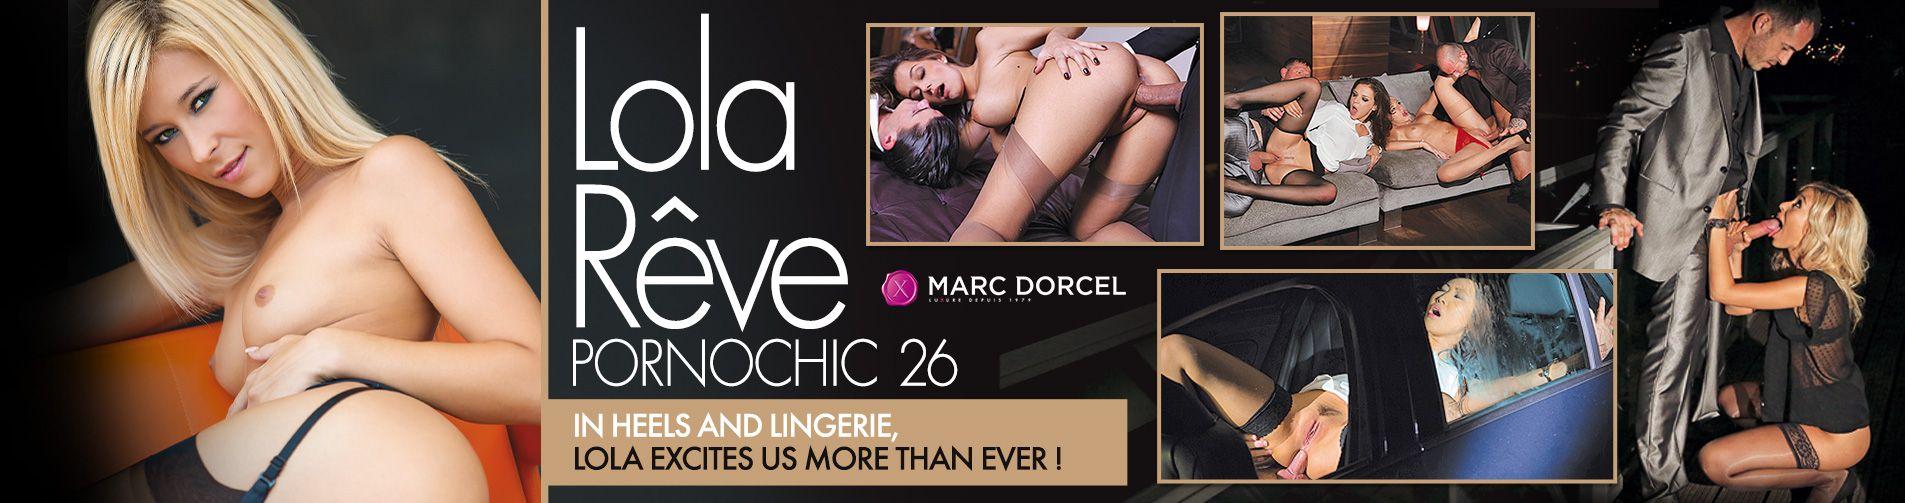 Pornochic 26 Lola Reve